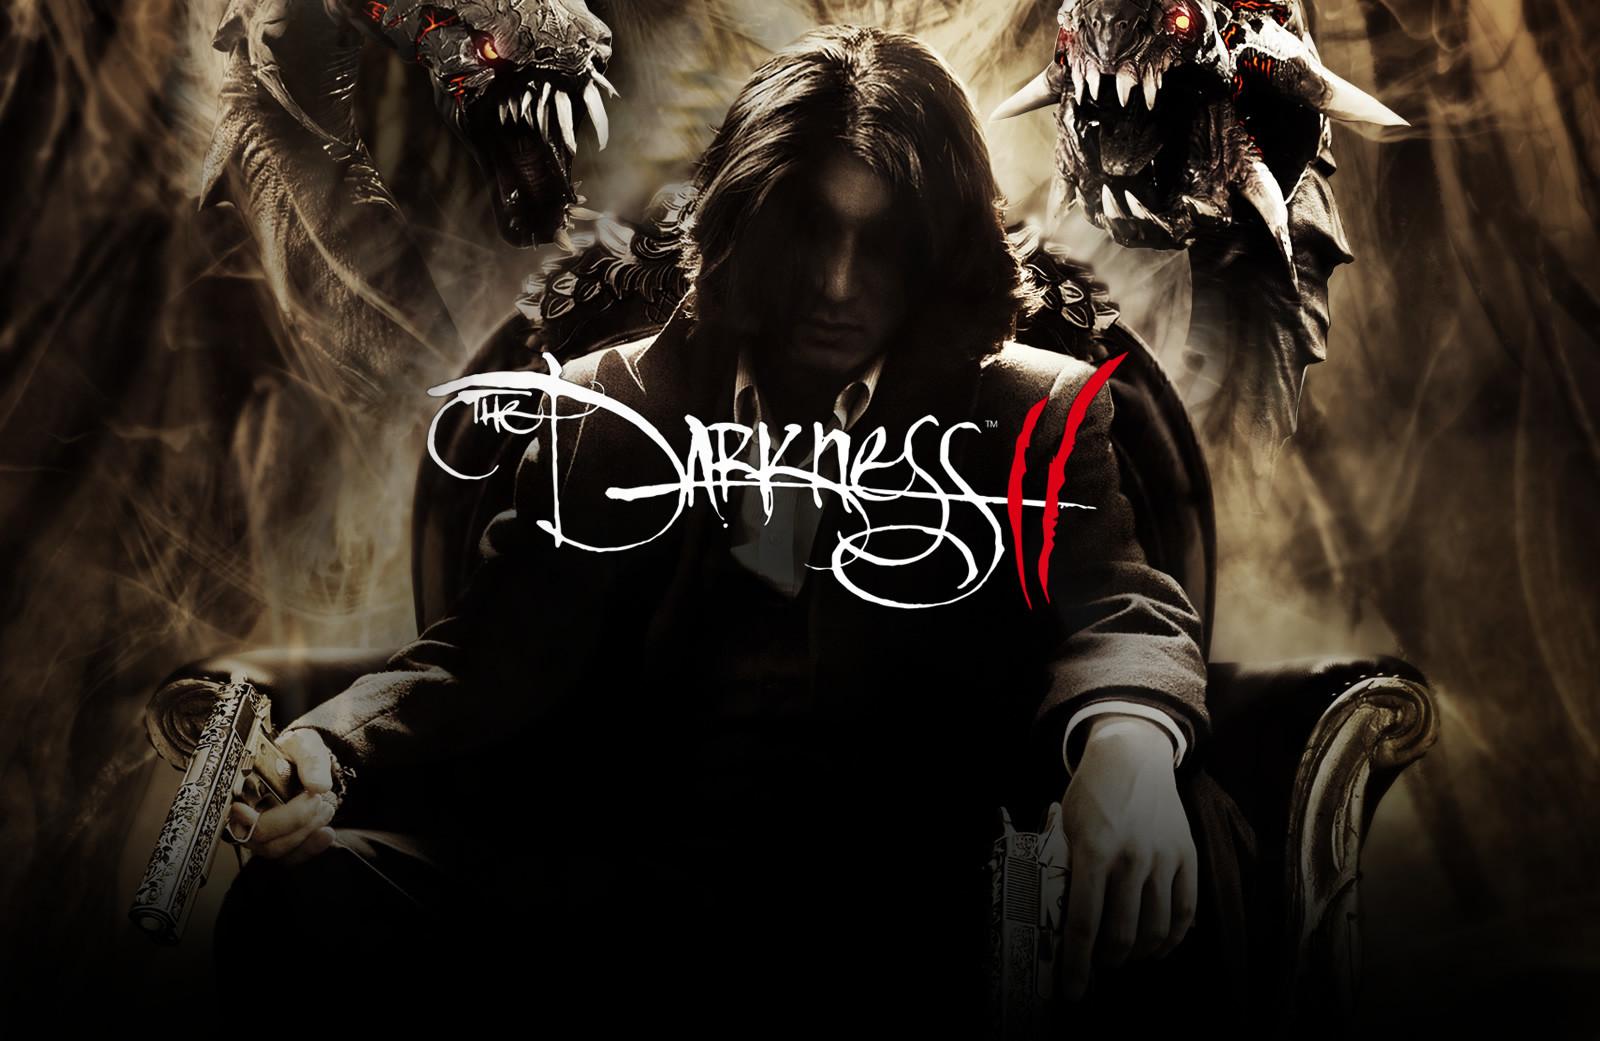 Home Bundle ofrece gratuitamente The Darkness II